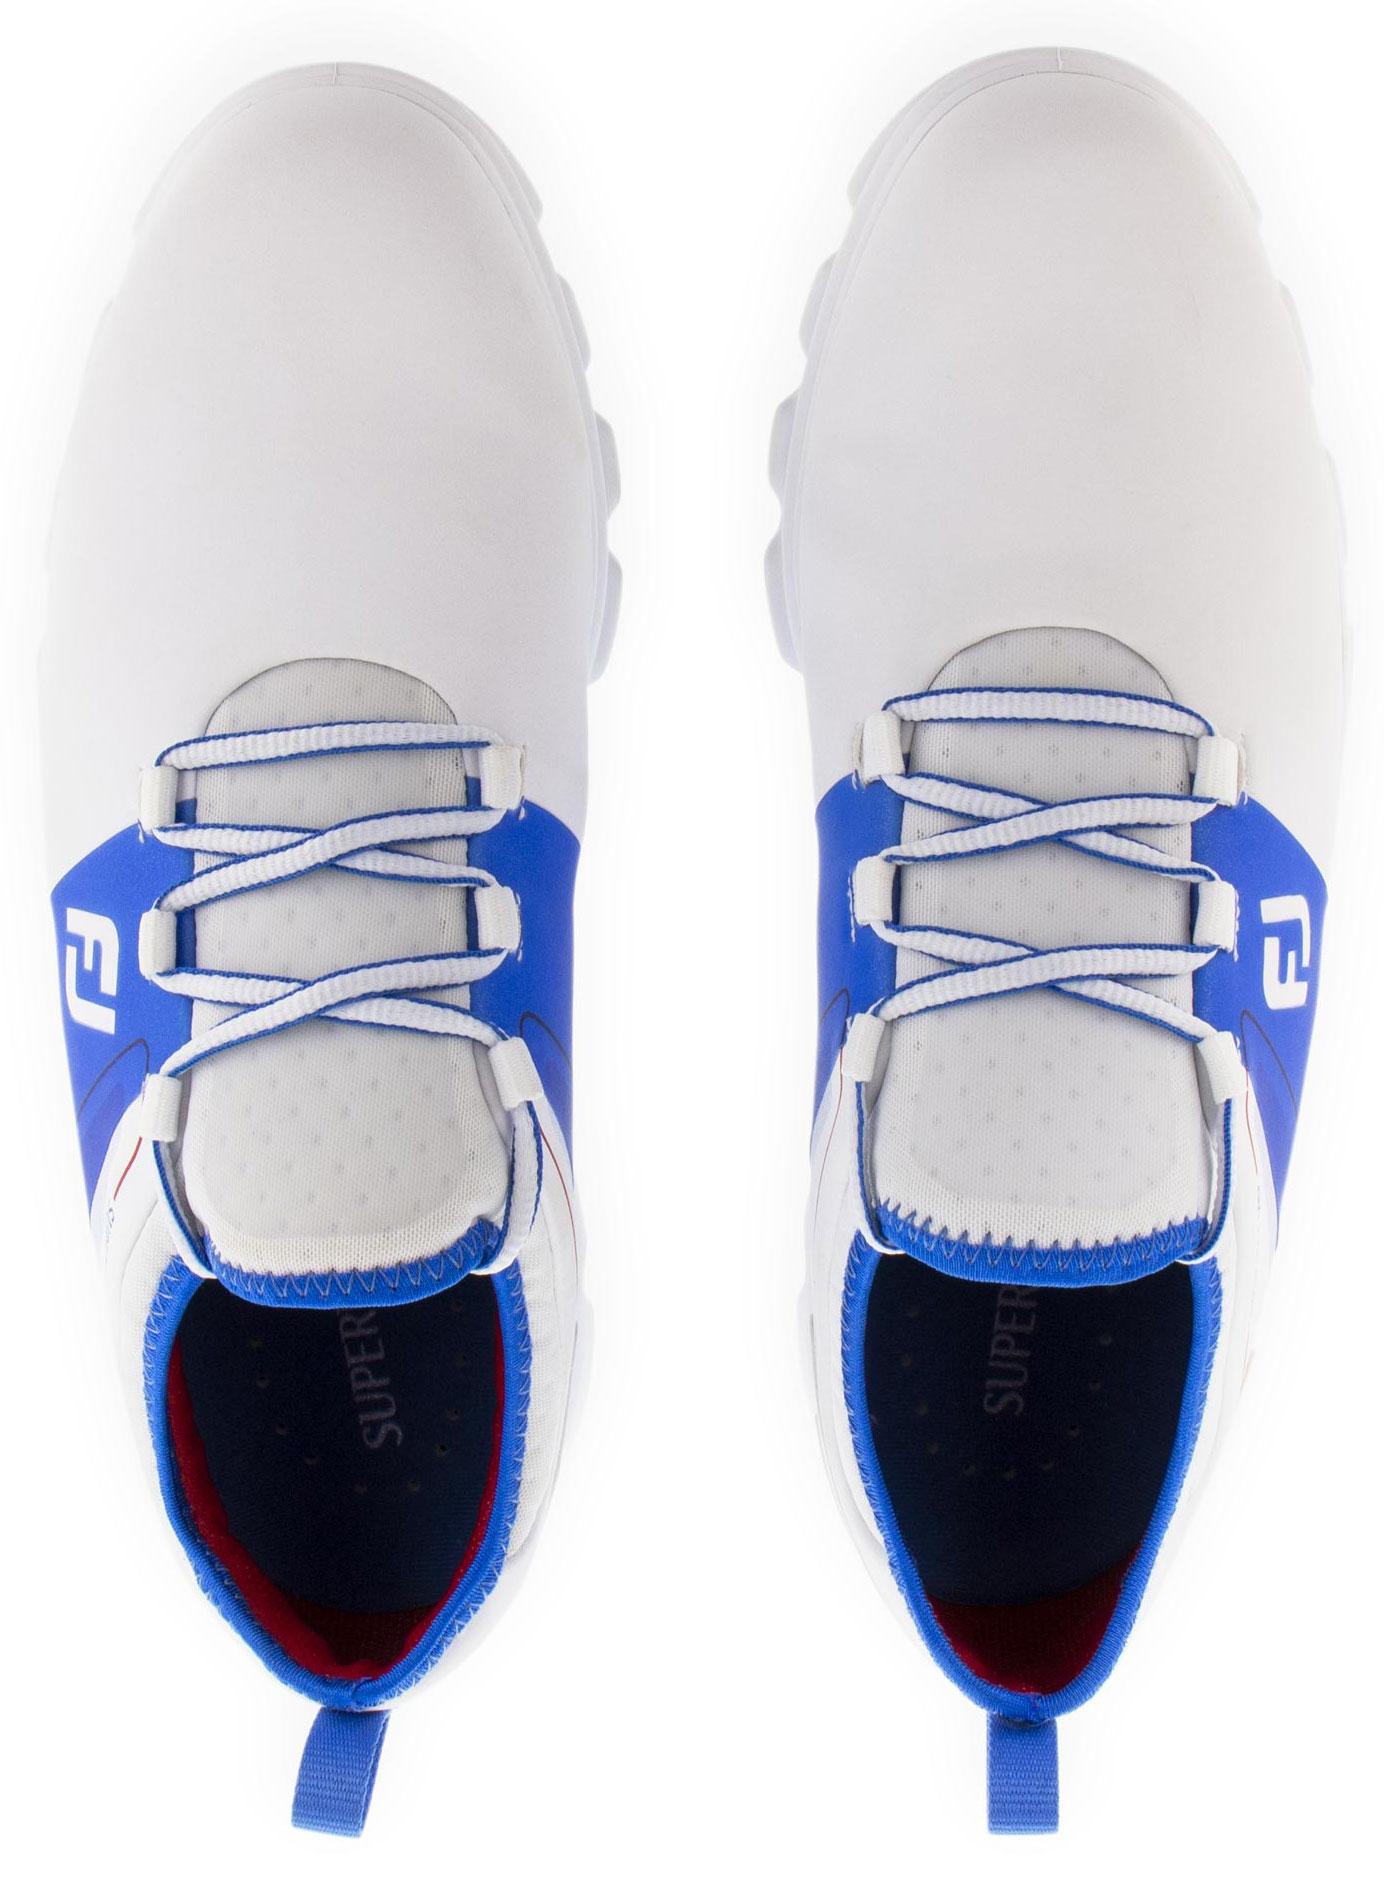 FootJoy-Superlites-XP-Golf-Shoes-Men-039-s-New thumbnail 13